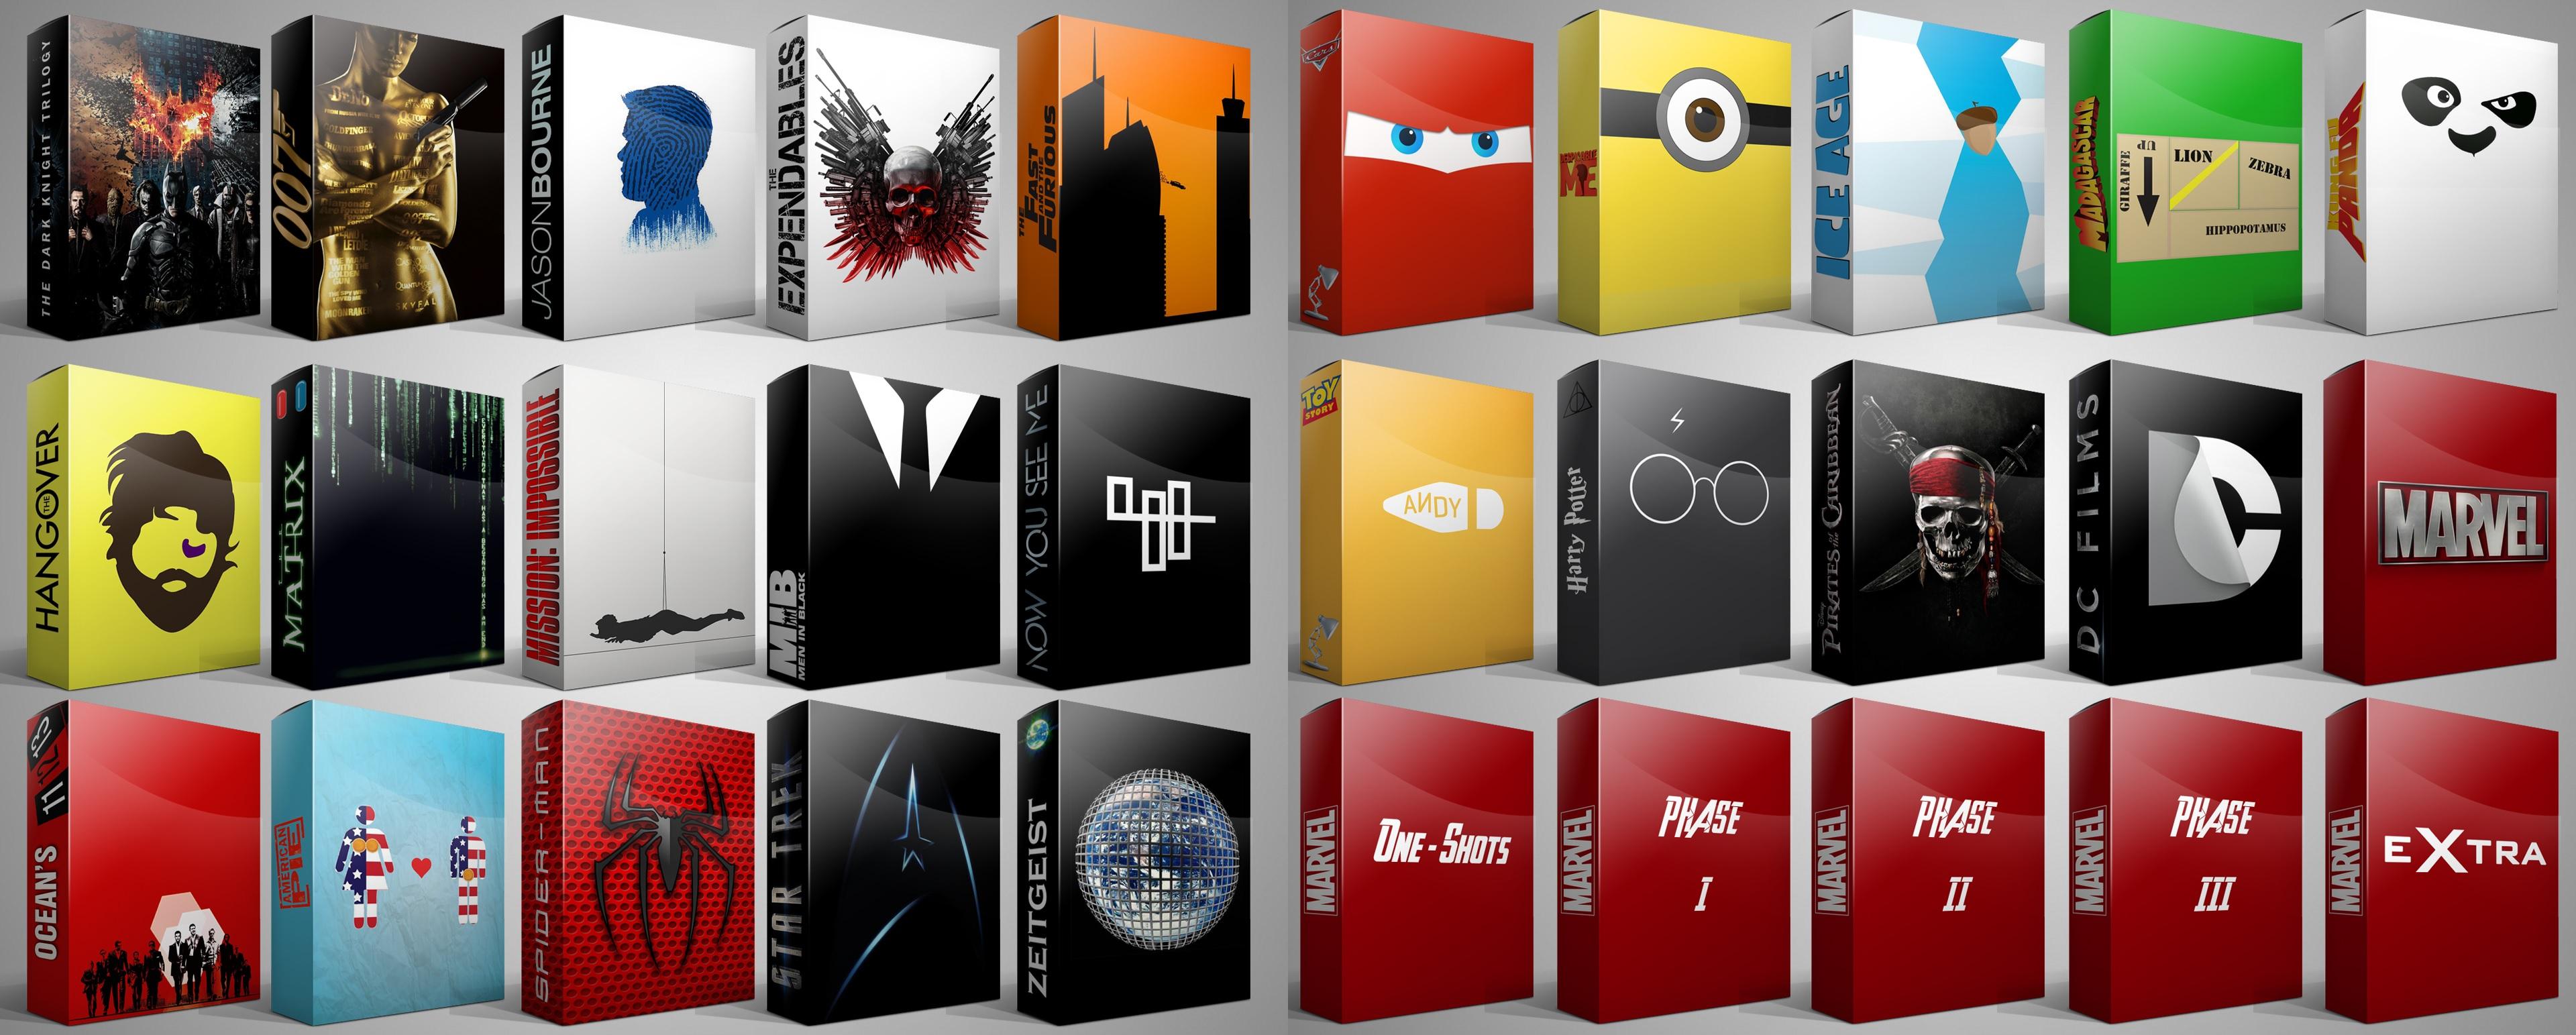 Movies Series Box Set Folder Icons By Drac-69 On DeviantArt